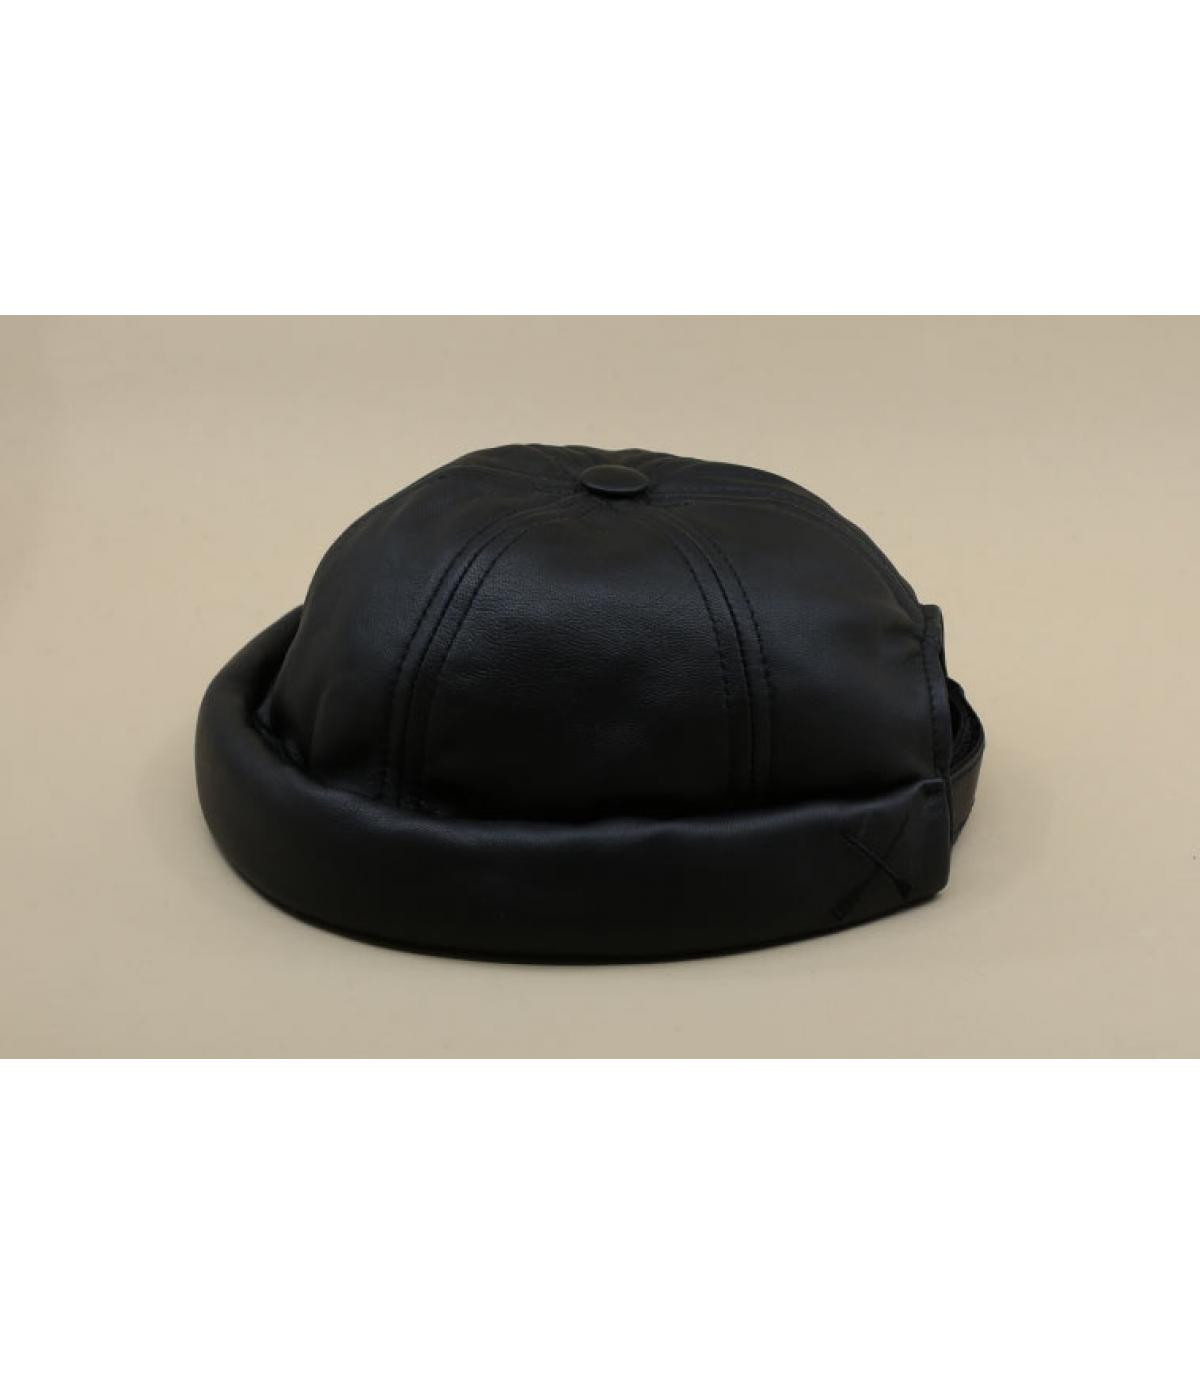 Detalles Miki Leather Waxy black imagen 2